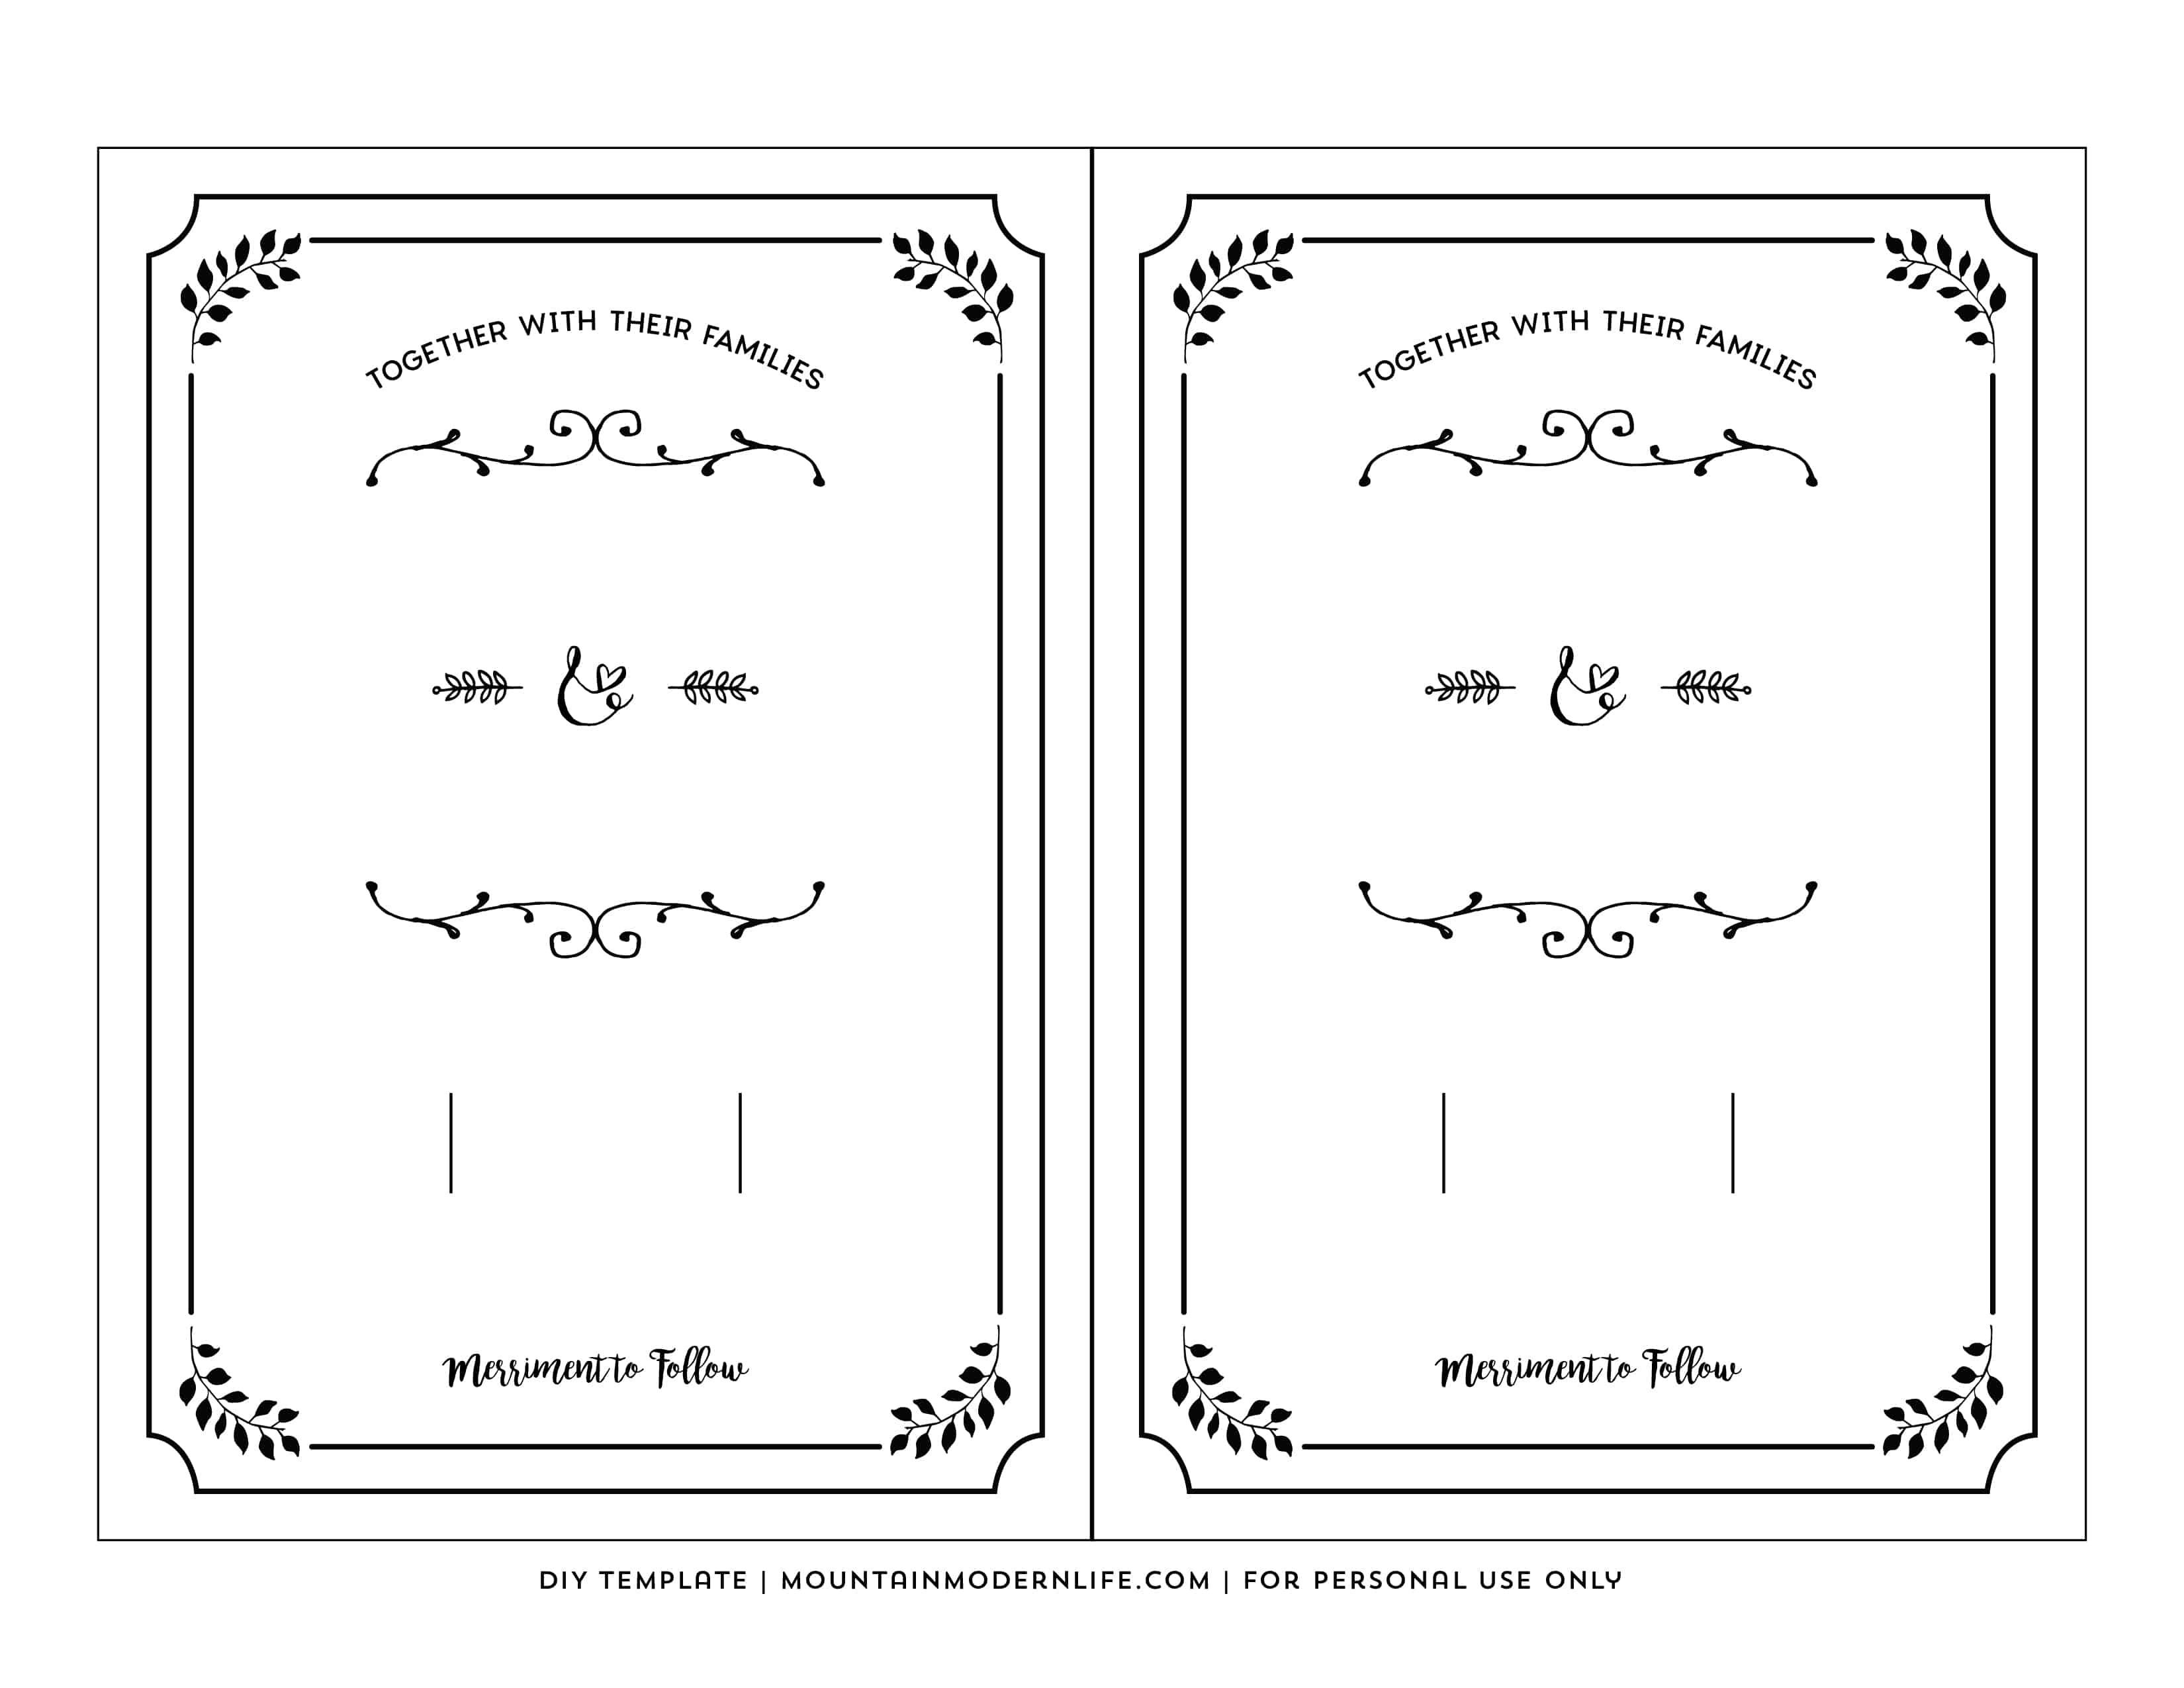 Free Printable Wedding Invitation Template - Free Printable Wedding Invitations Templates Downloads